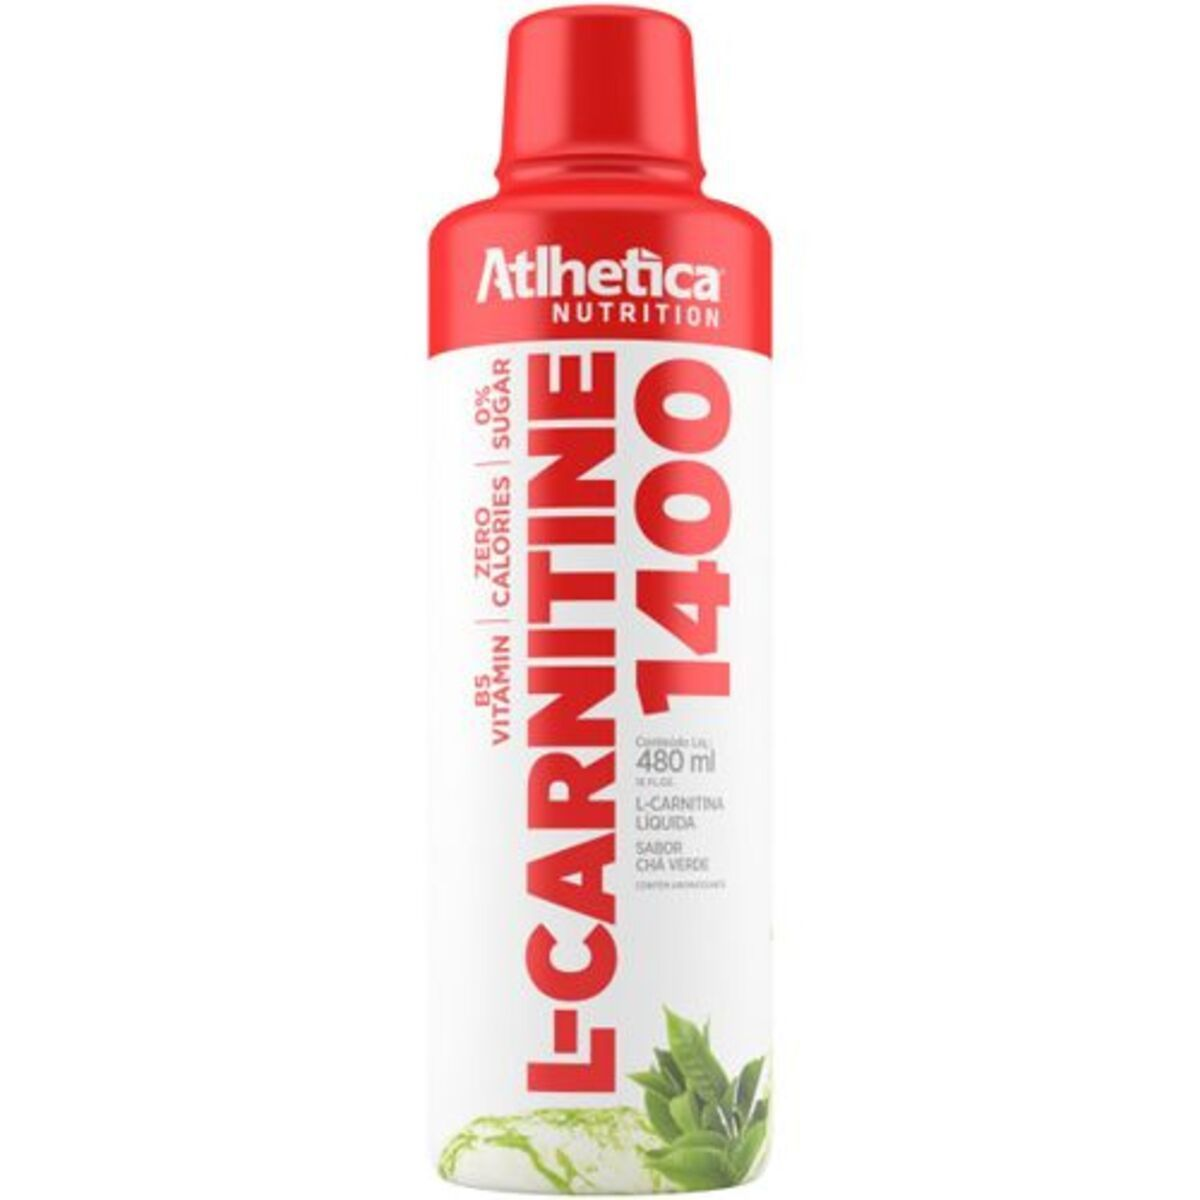 L CARNITINE 1400 CHA VERDE 480ML - Atlhetica